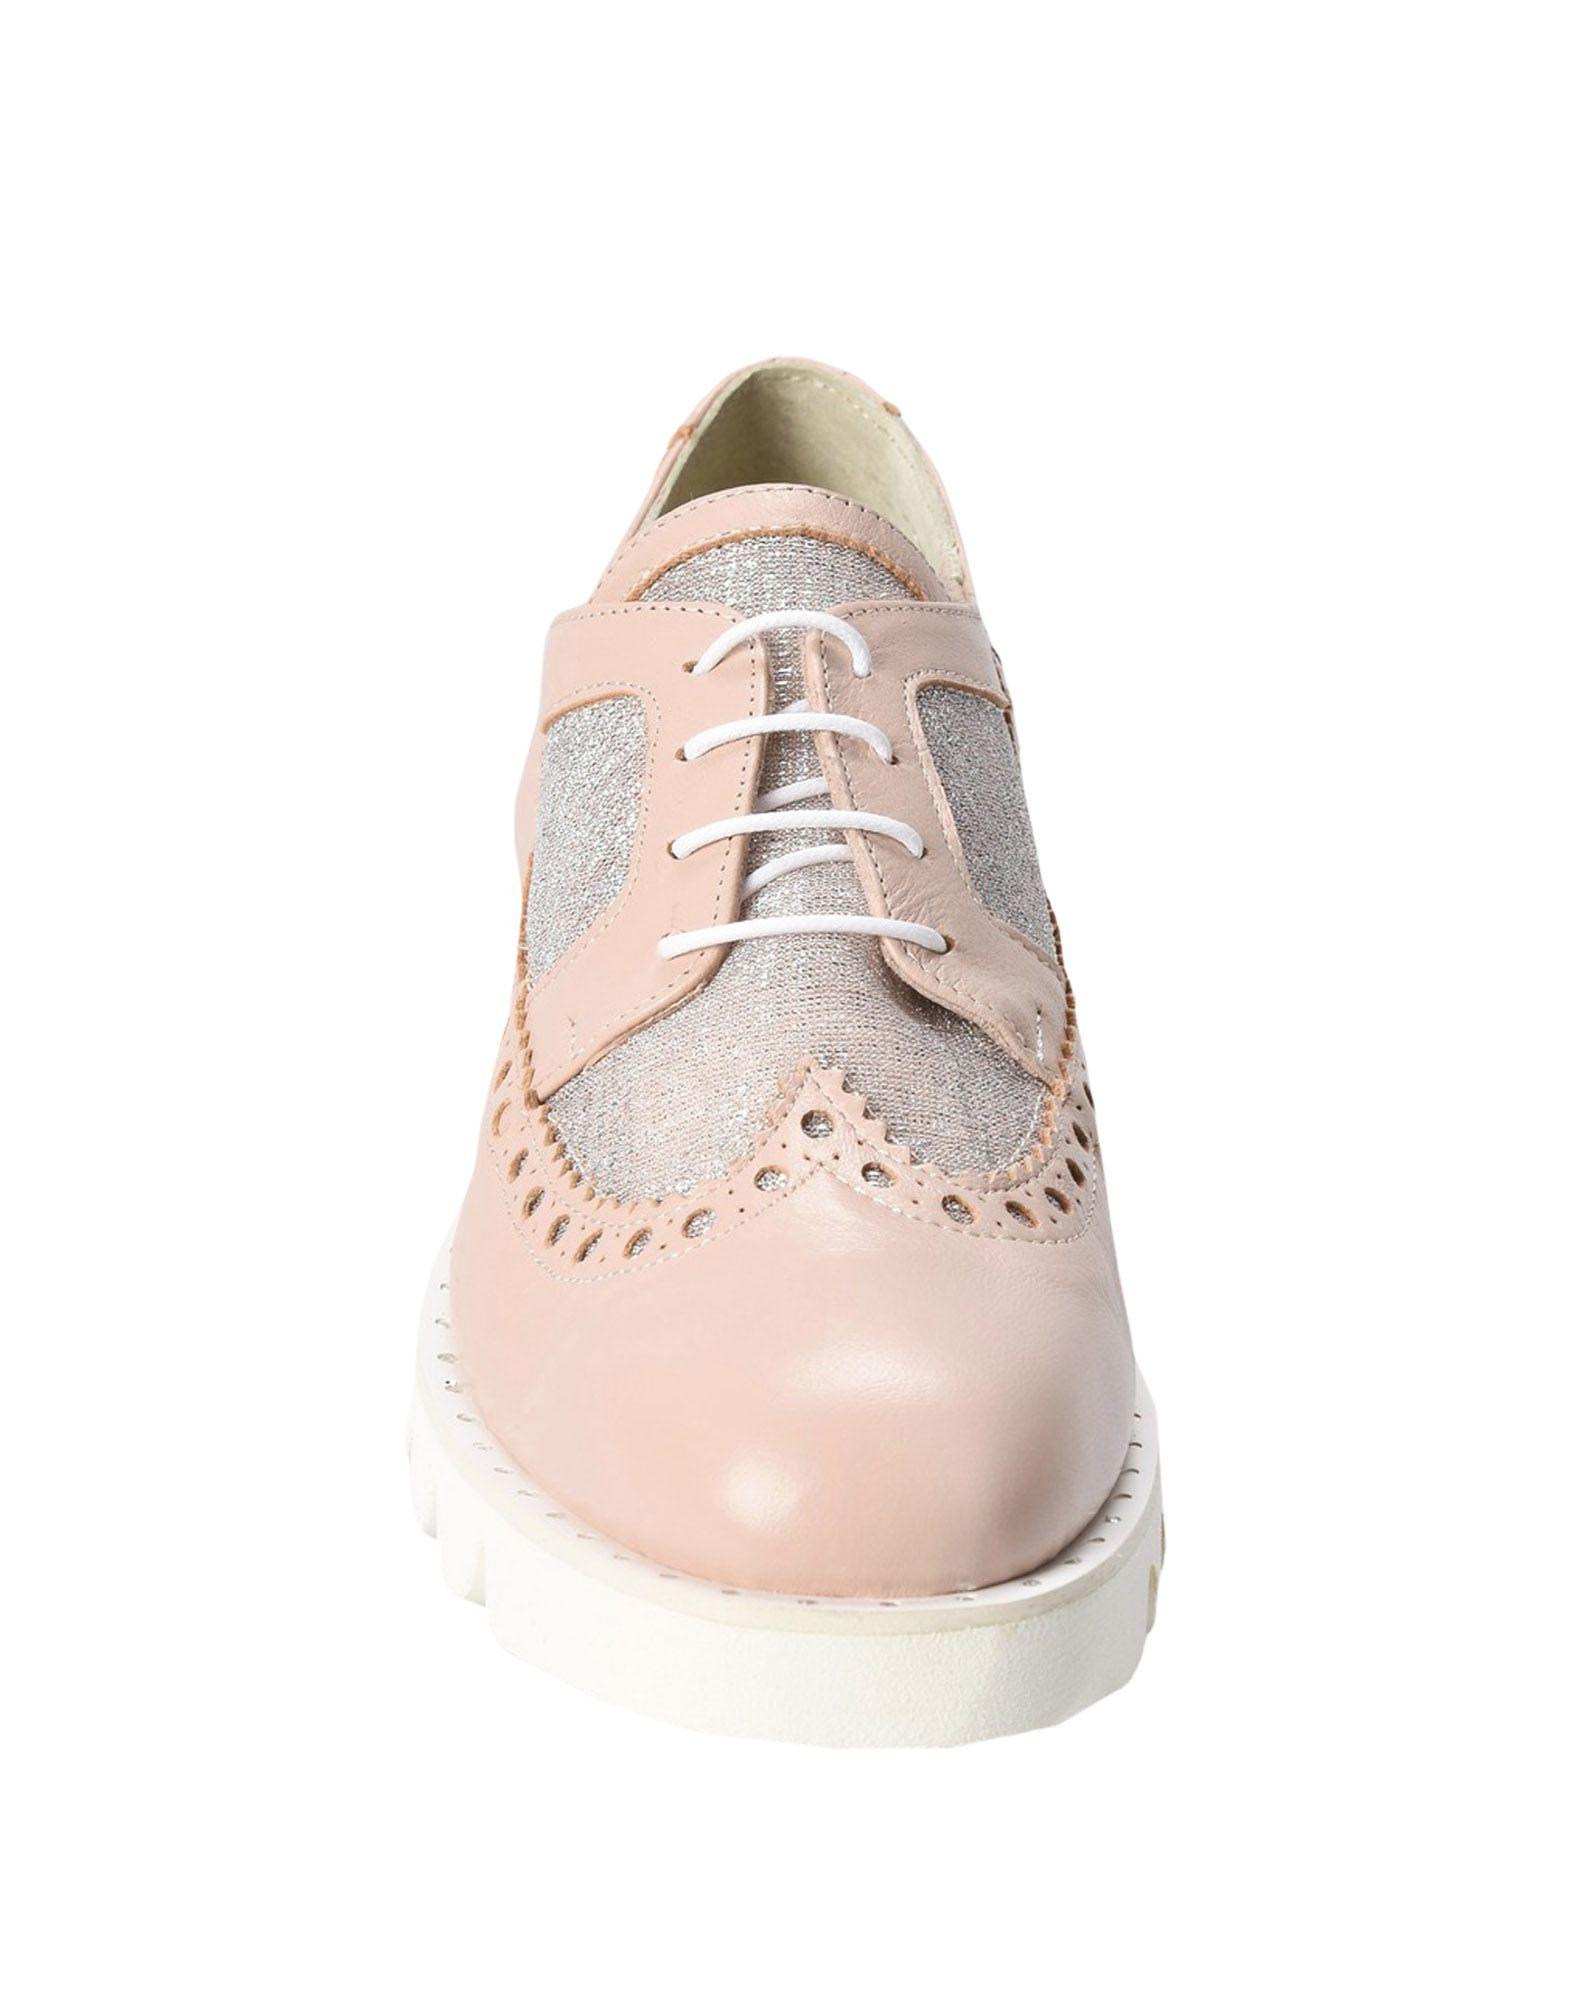 Giordana F. Schnürschuhe Damen  11458391AJ Gute Qualität beliebte beliebte Qualität Schuhe 1982d2